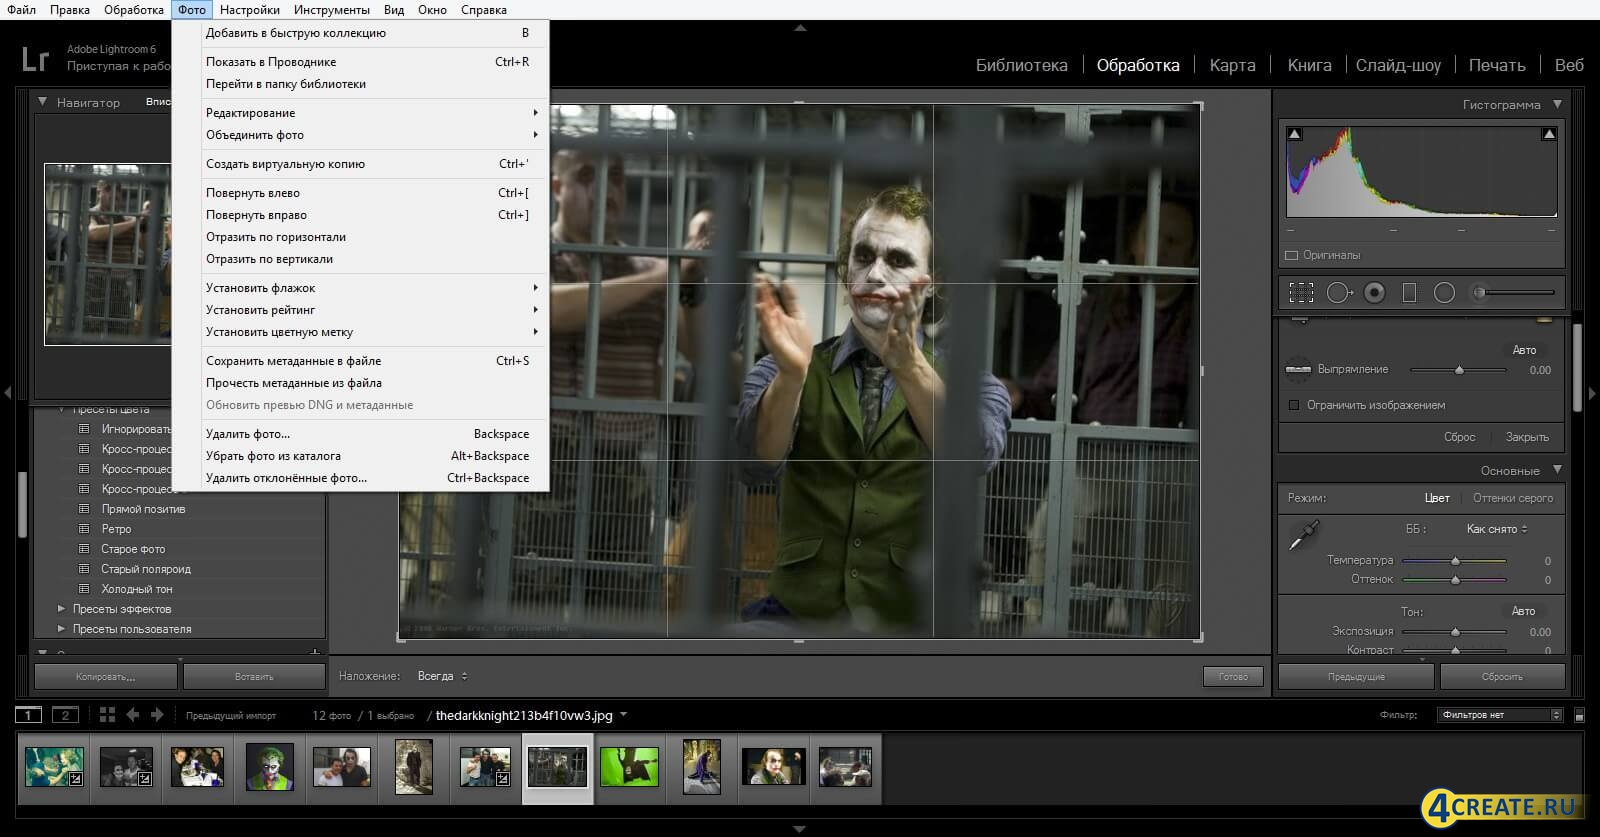 Adobe Lightroom CC (Скриншот 4)